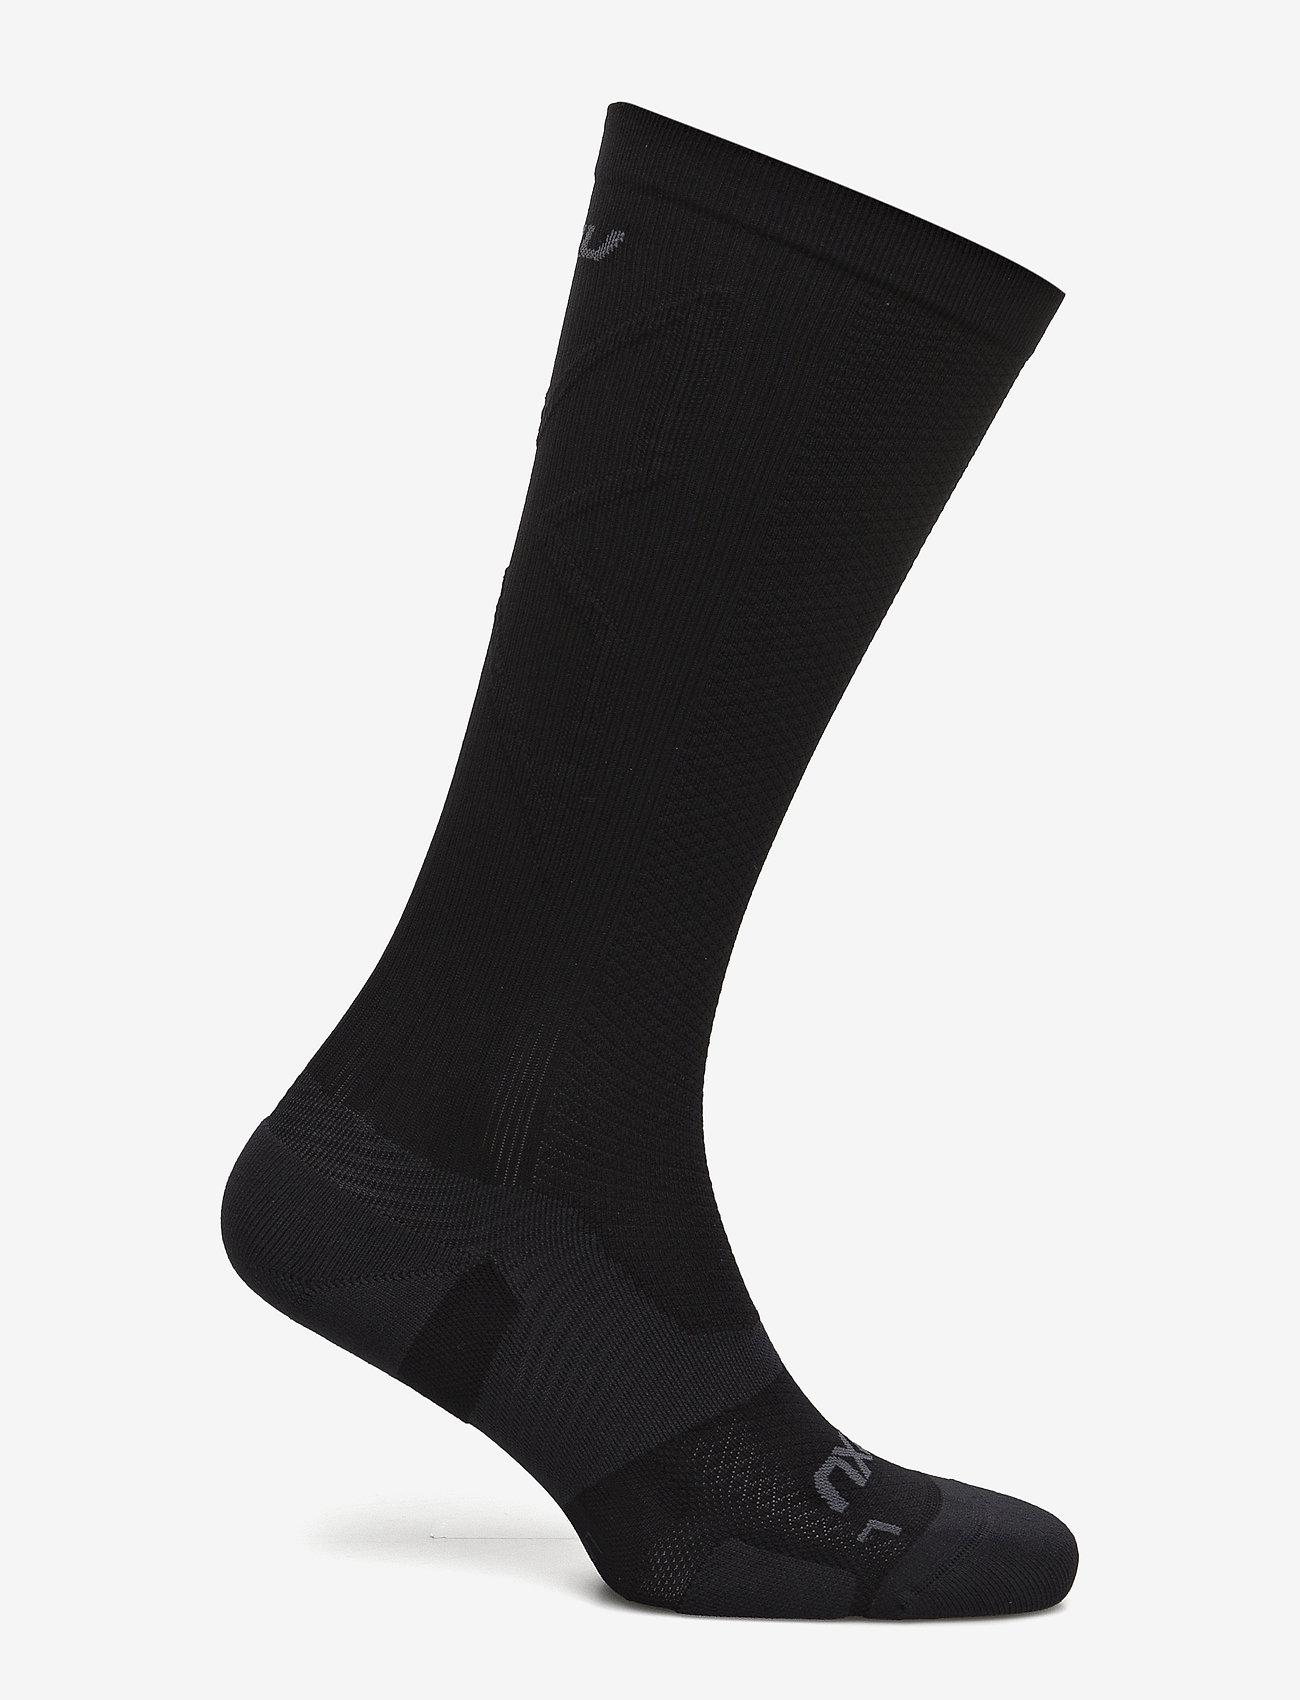 2XU - VECTR LIGHT CUSHION FULL LENG - tavalliset sukat - black/titanium - 1